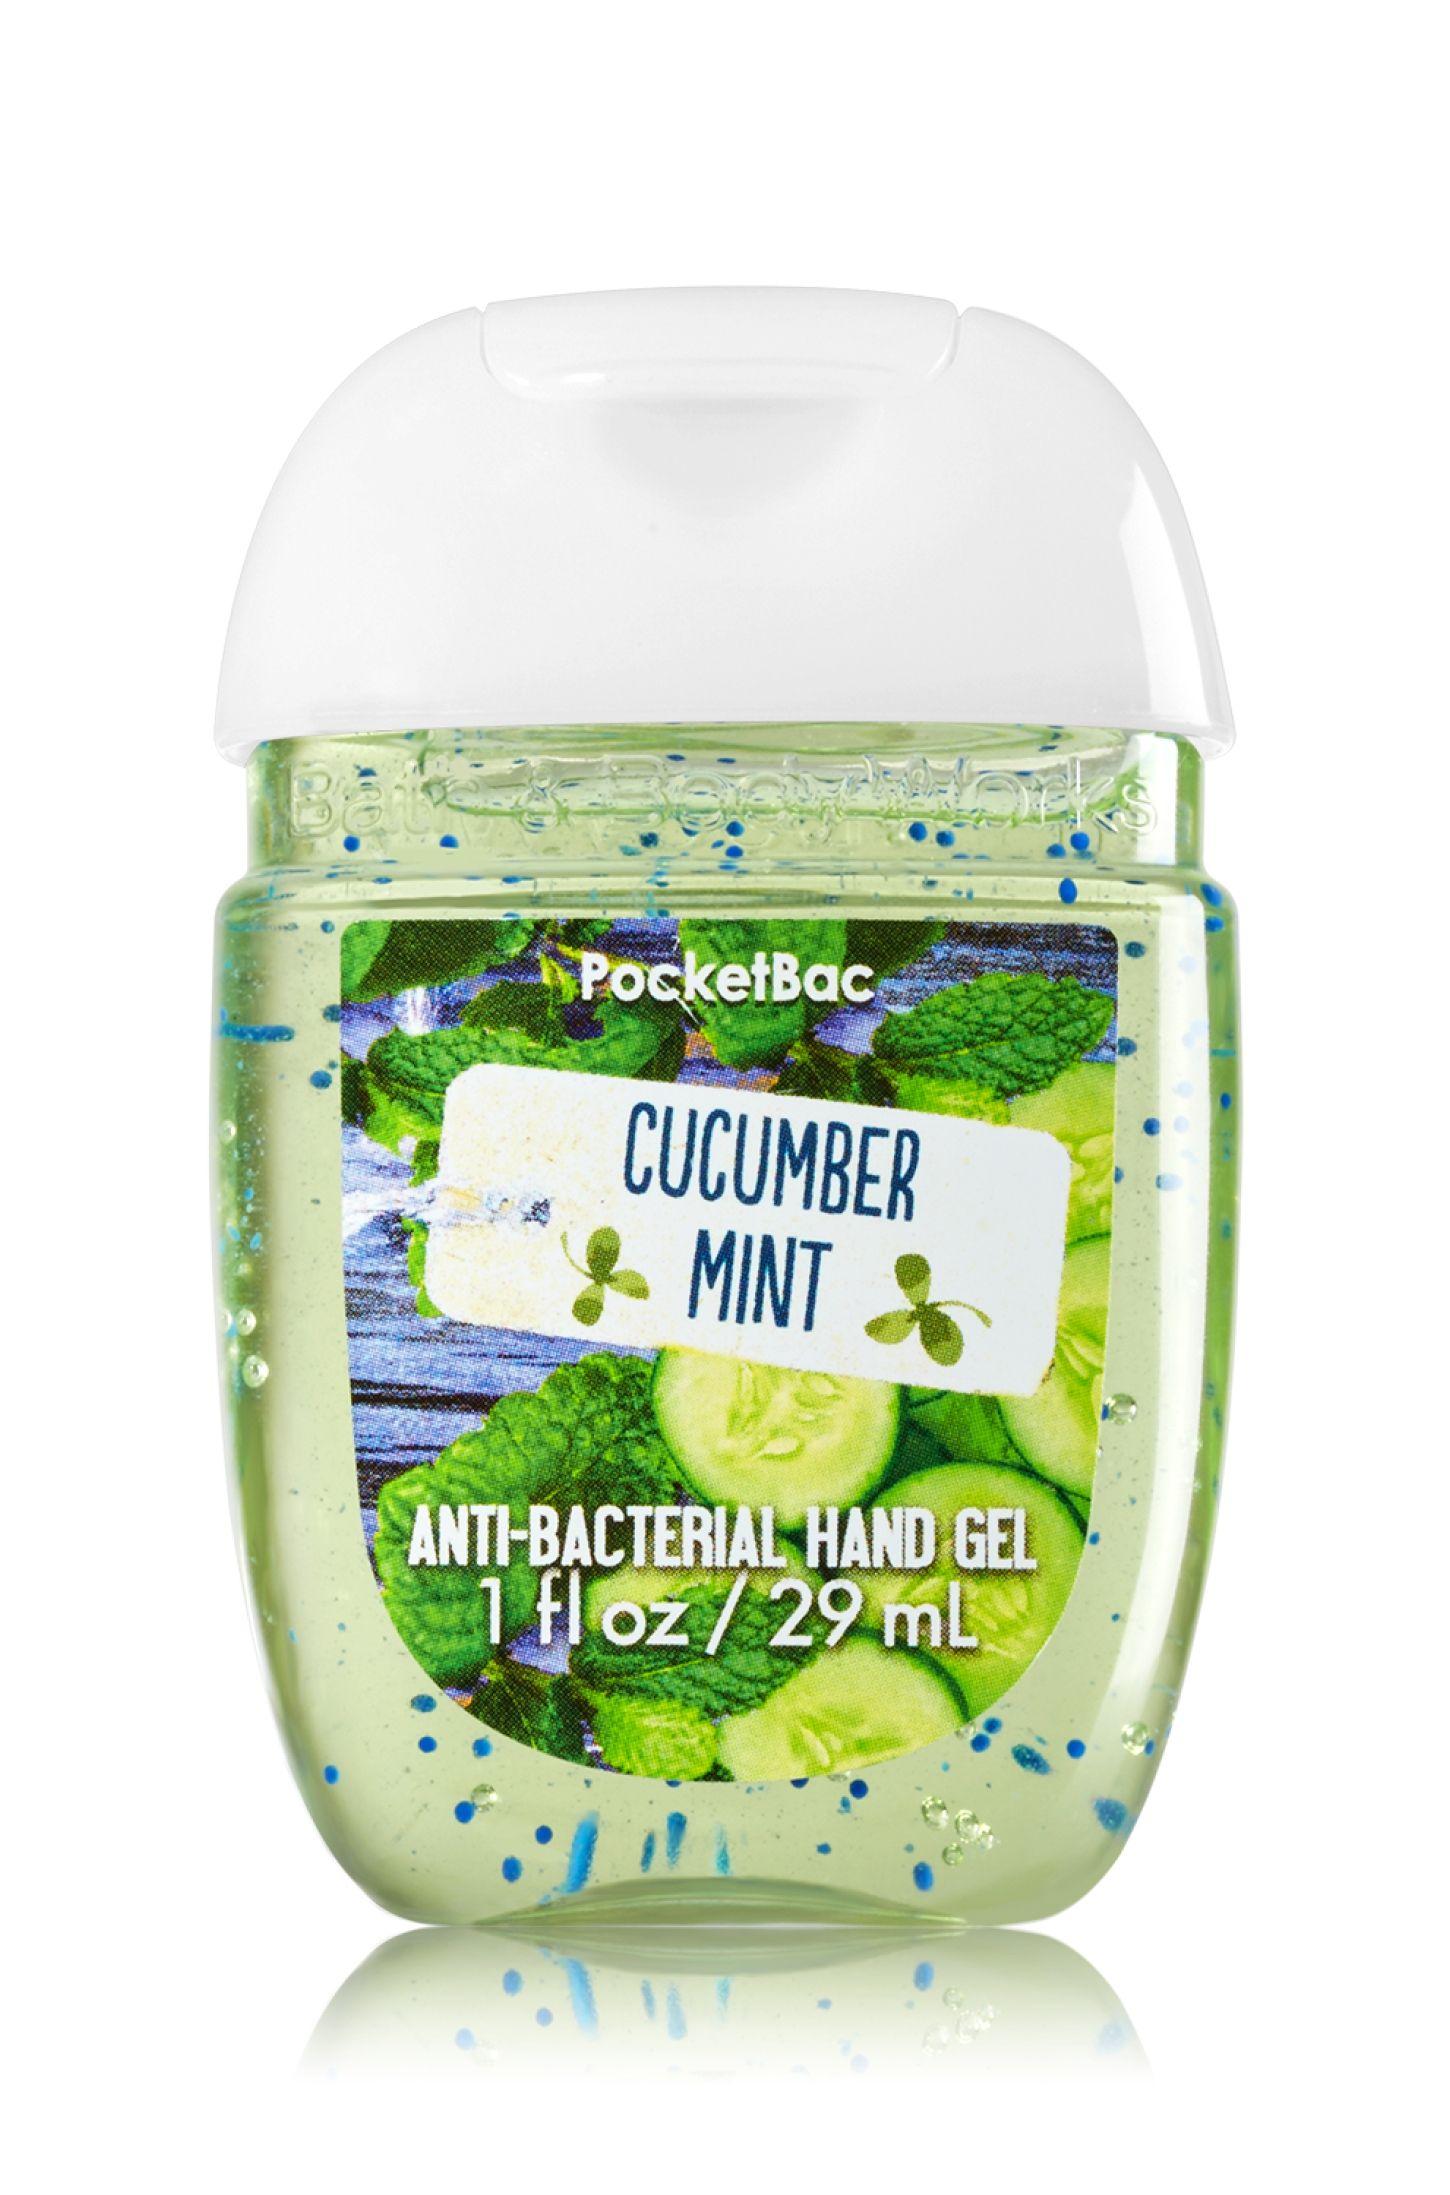 Eucalyptus Mint Foaming Hand Sanitizer Bath Body Works 5 50